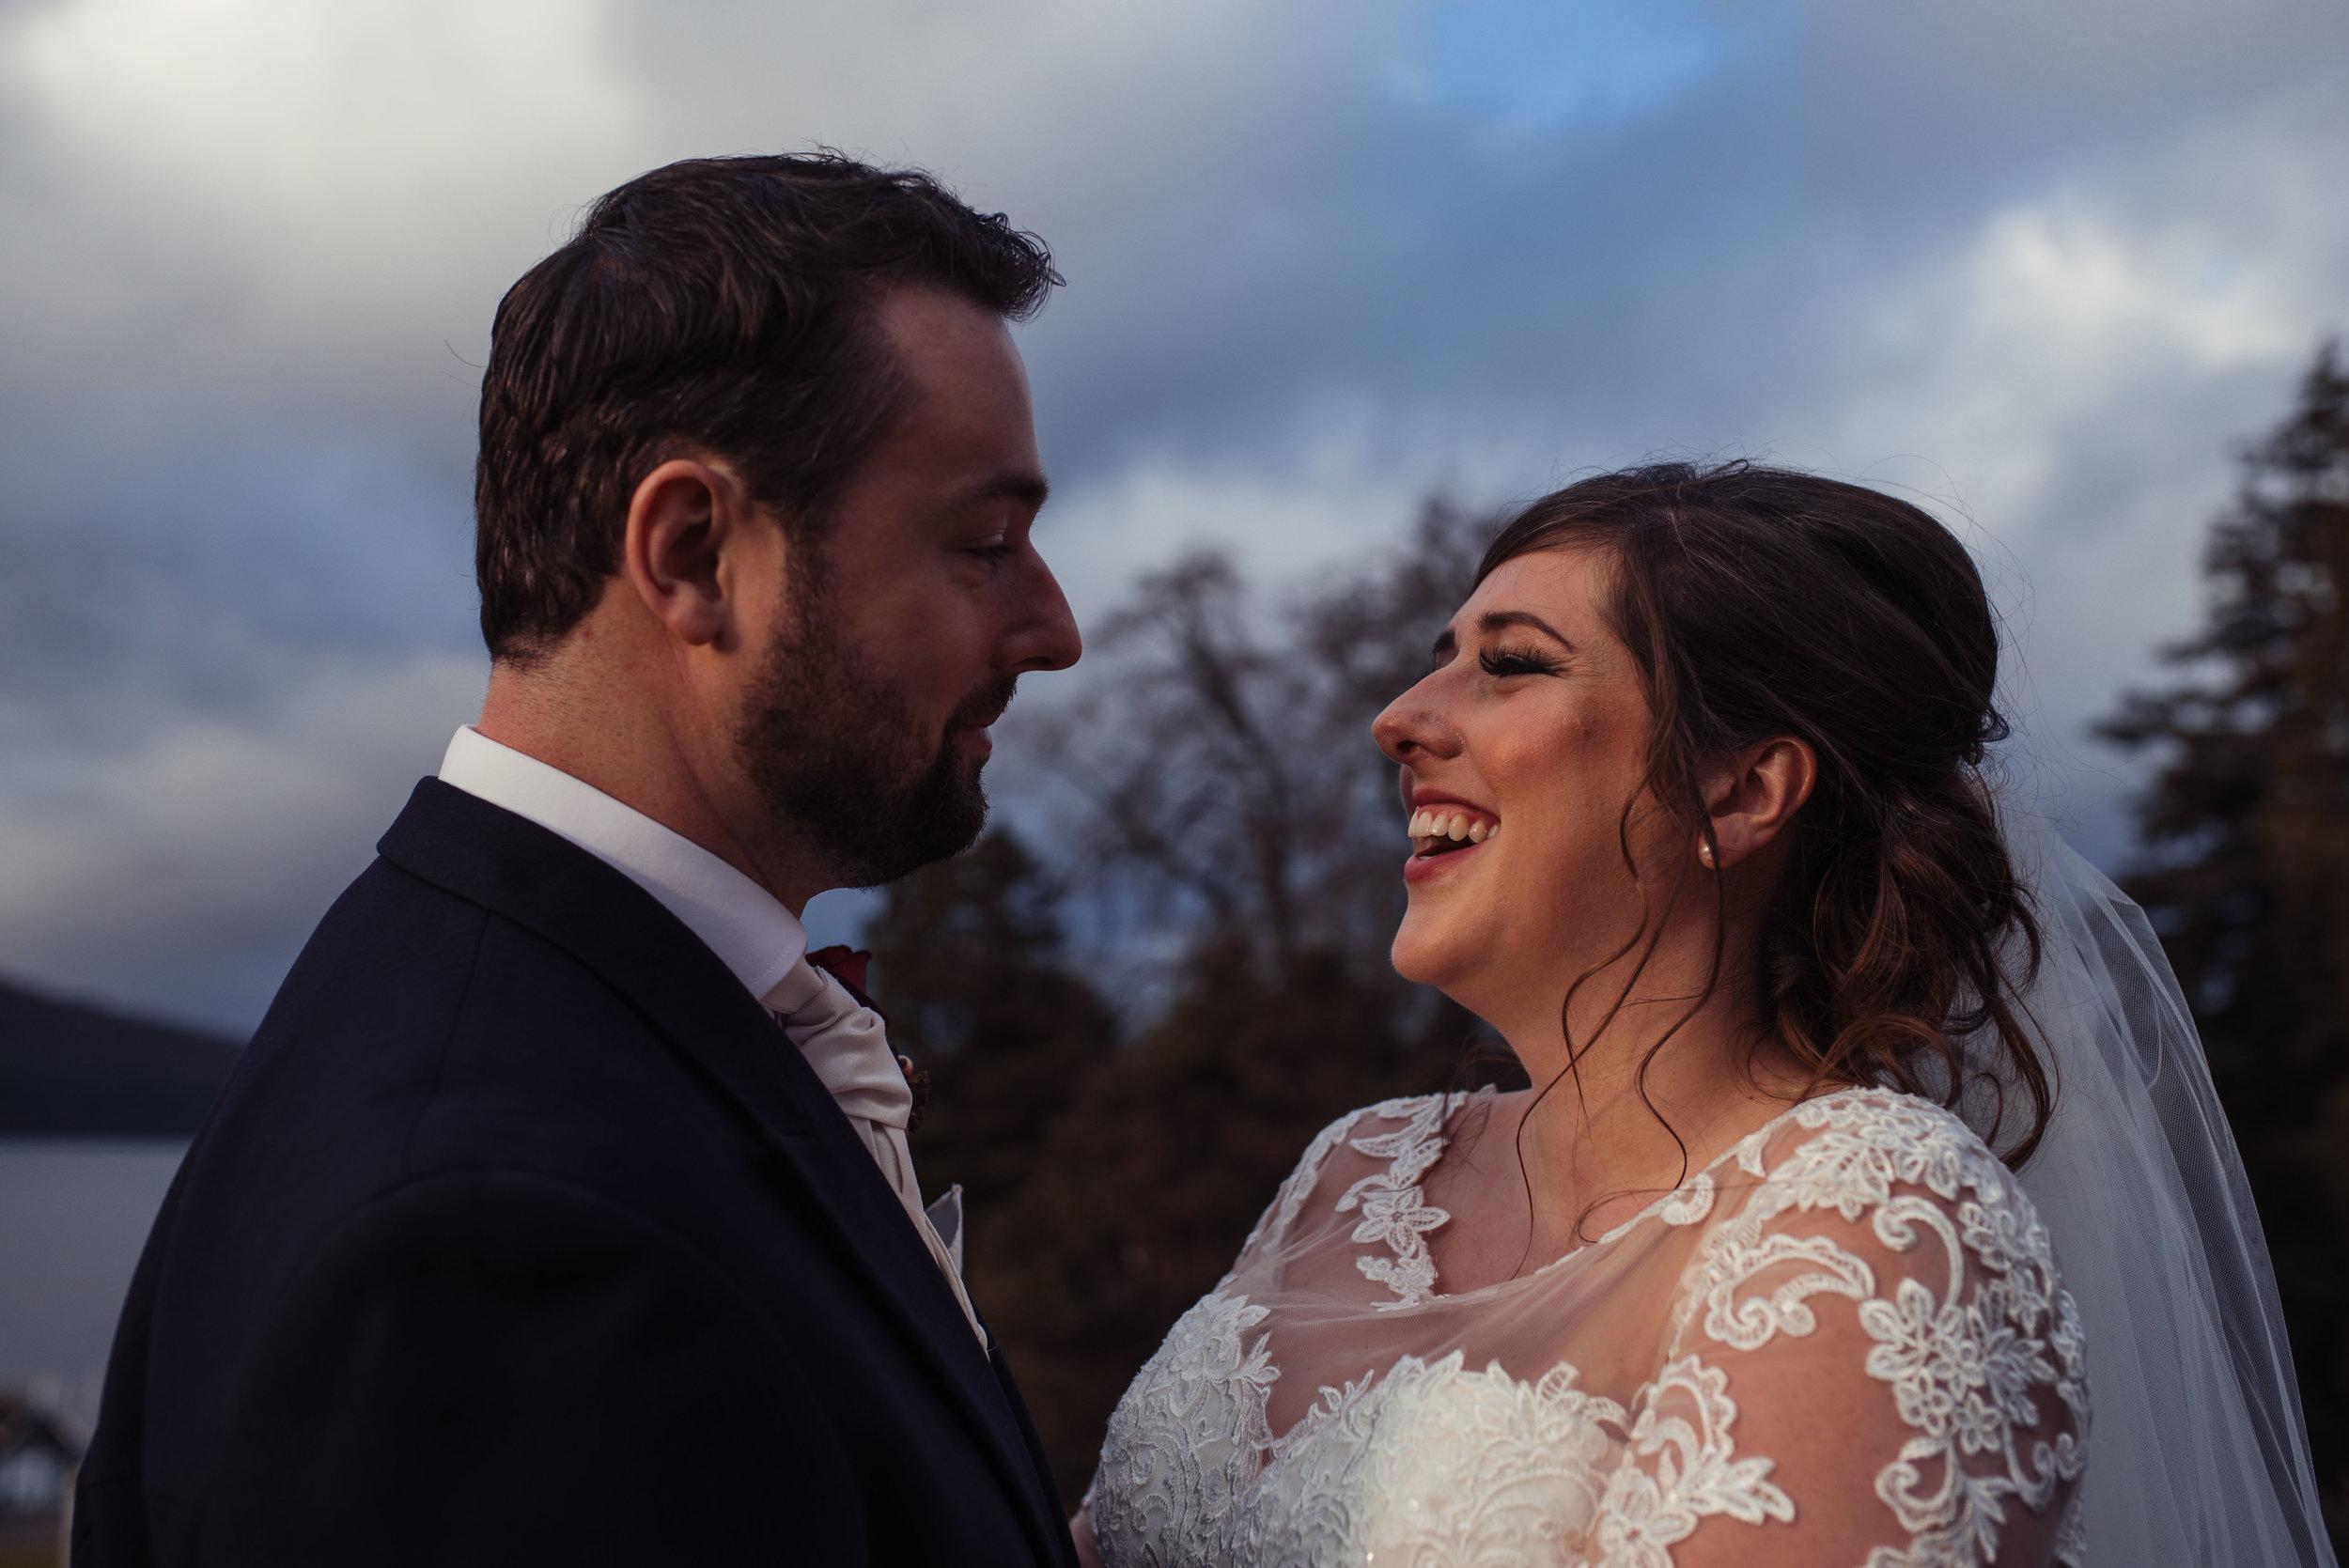 Belsfield-wedding-photography-28.jpg